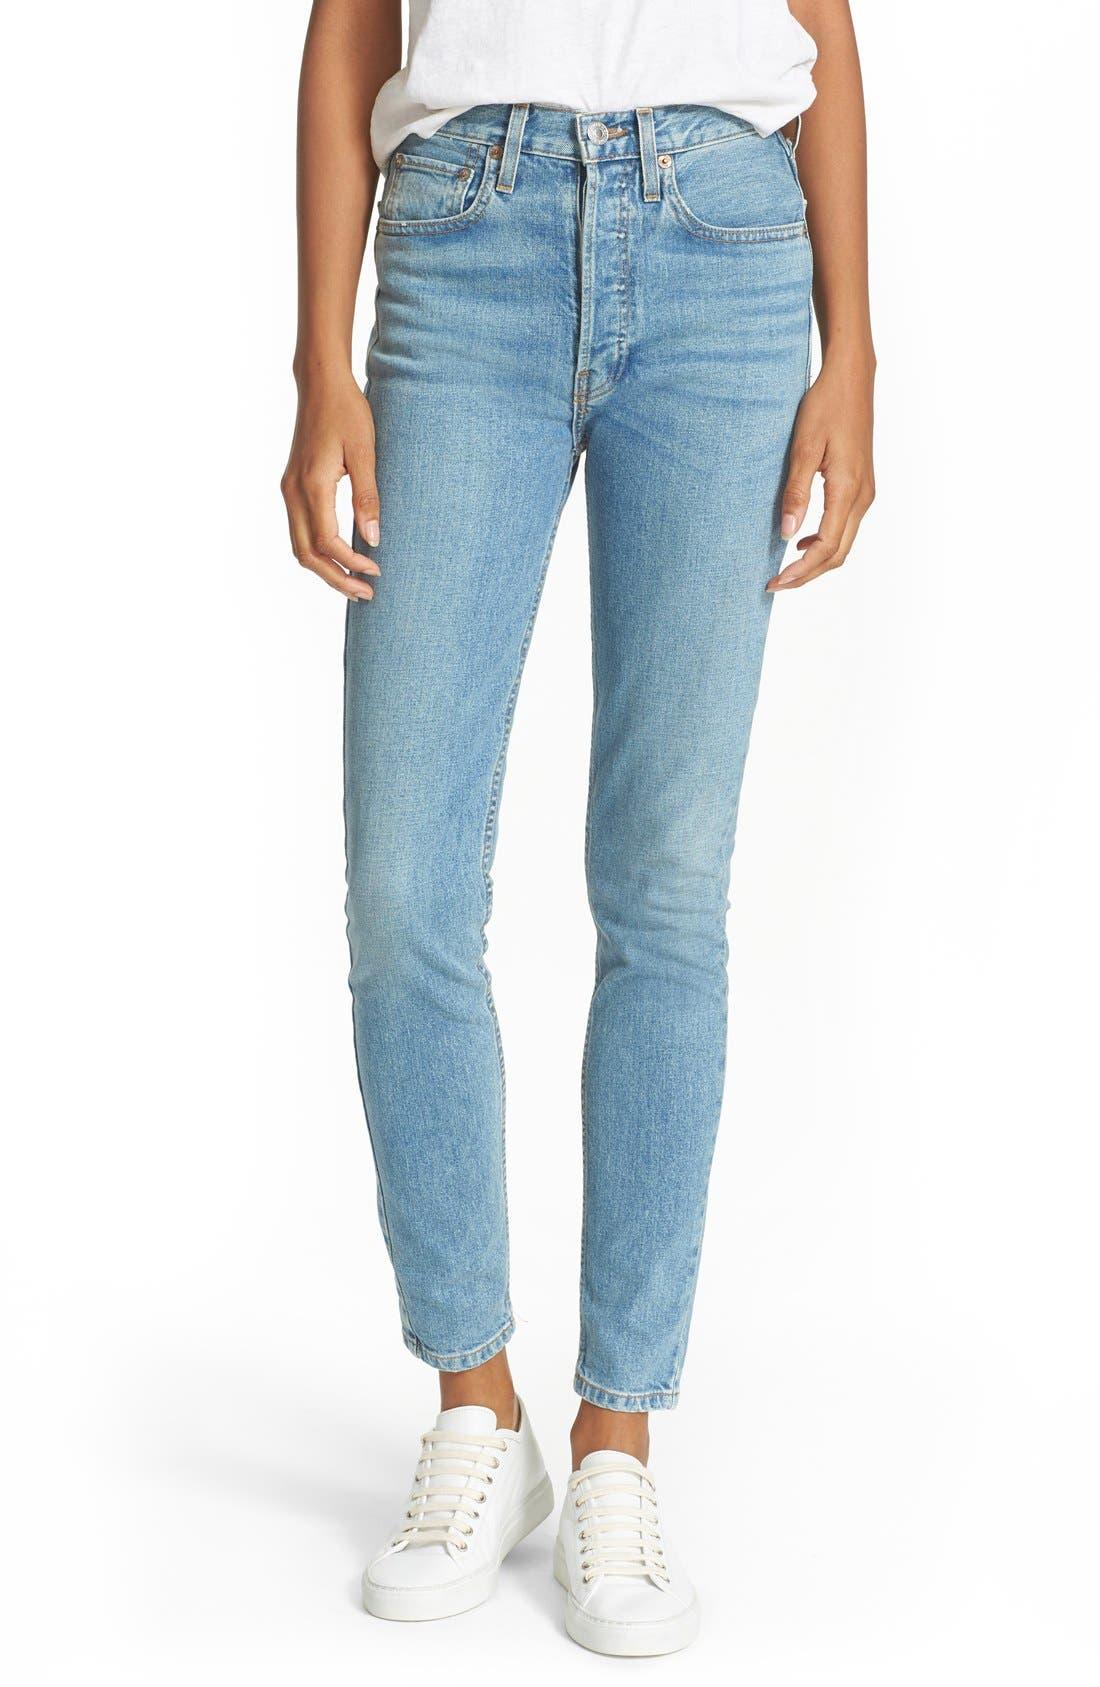 Originals High Rise Stretch Jeans,                             Main thumbnail 1, color,                             400